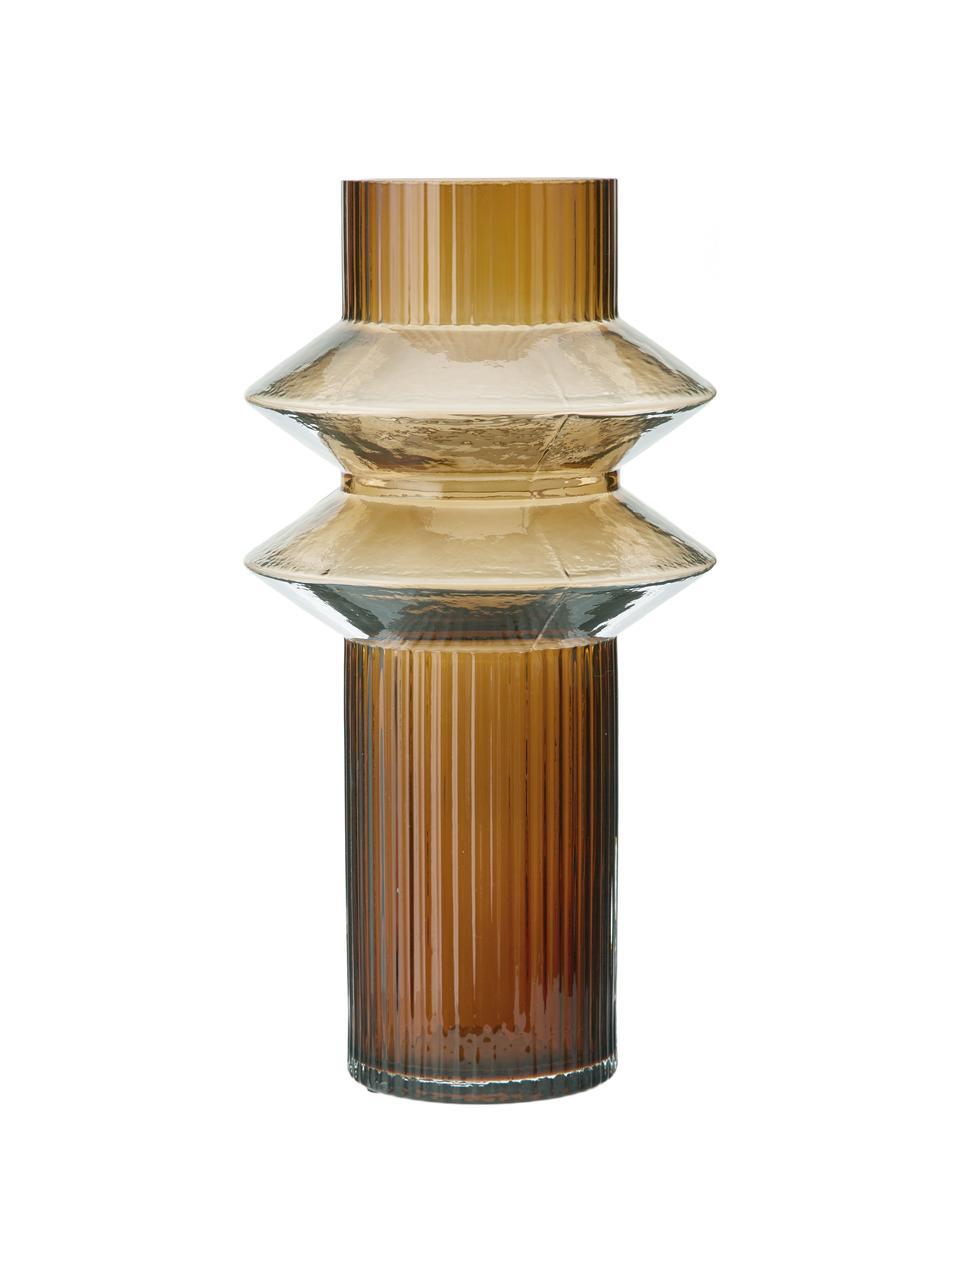 Vaso di design moderno in vetro Rilla, Vetro, Ambra, Ø 15 x Alt. 29 cm